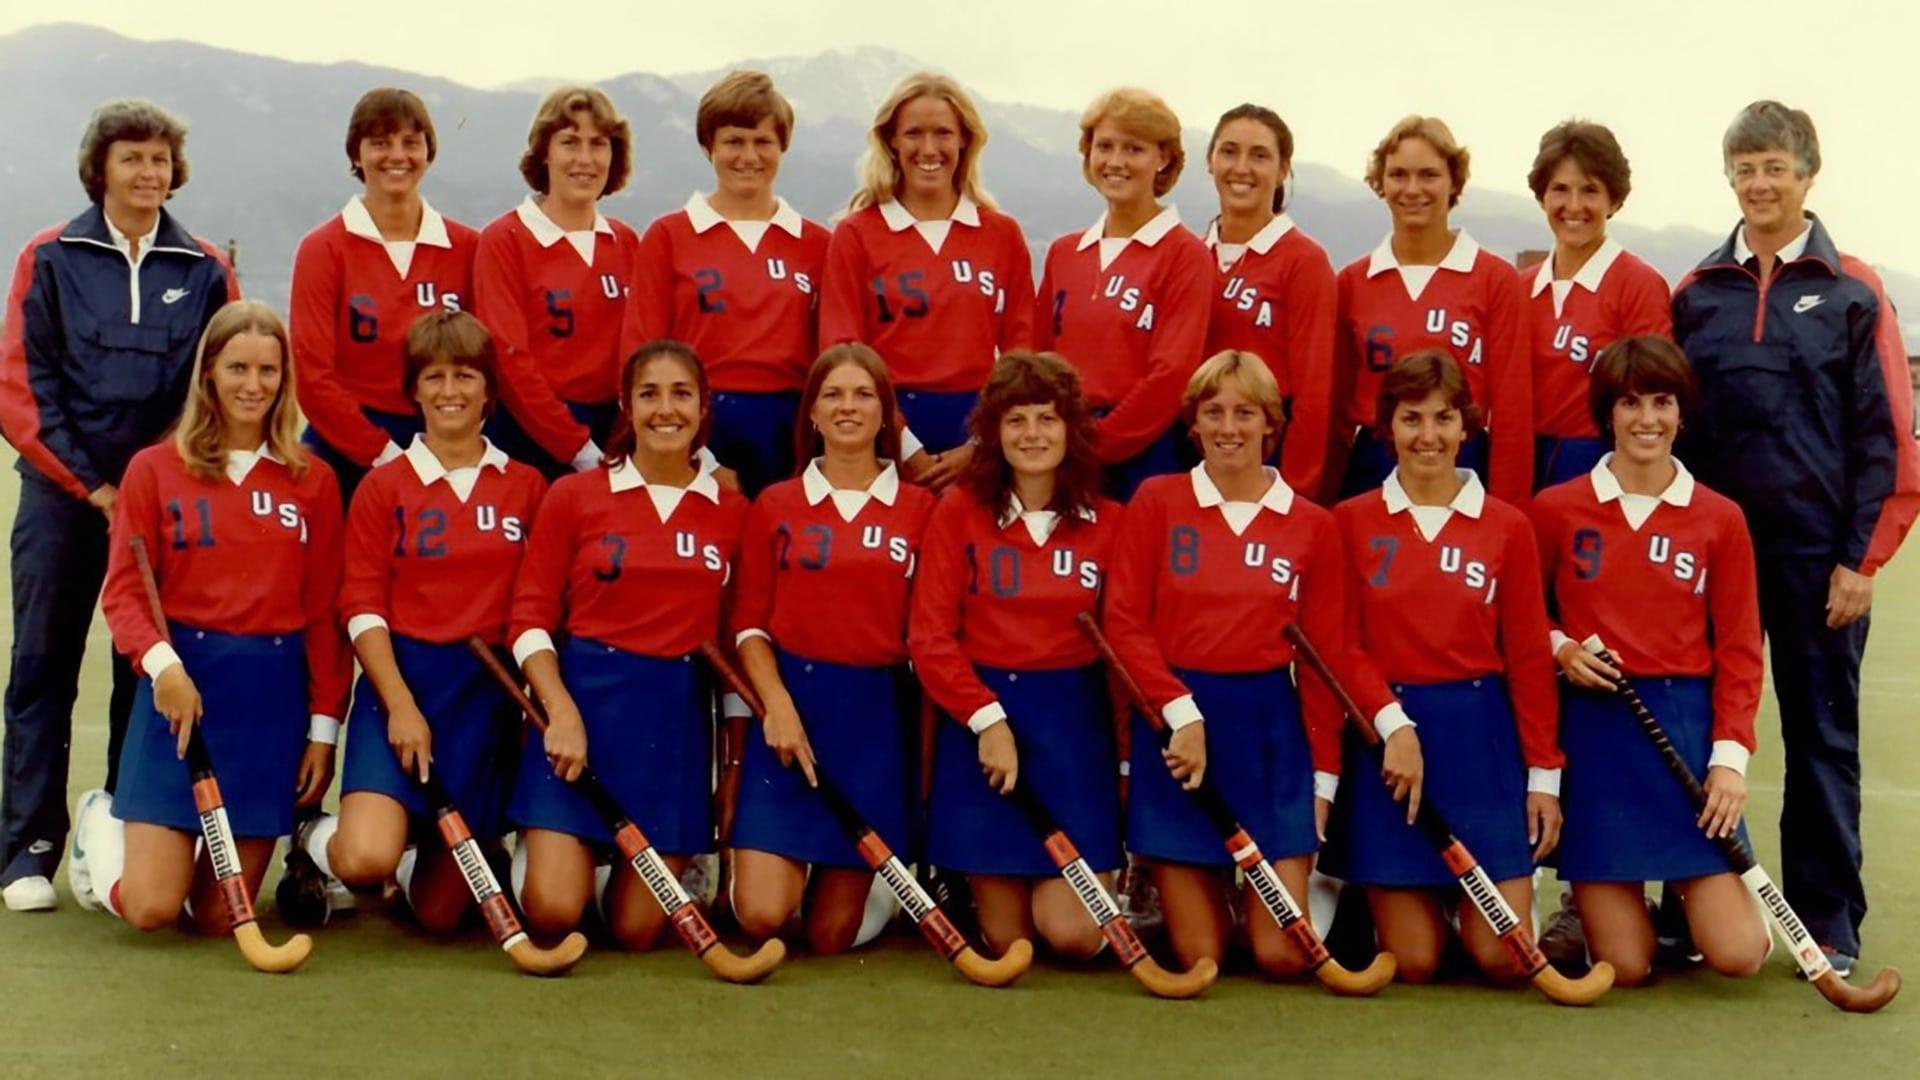 U.S. Field Hockey Team photo